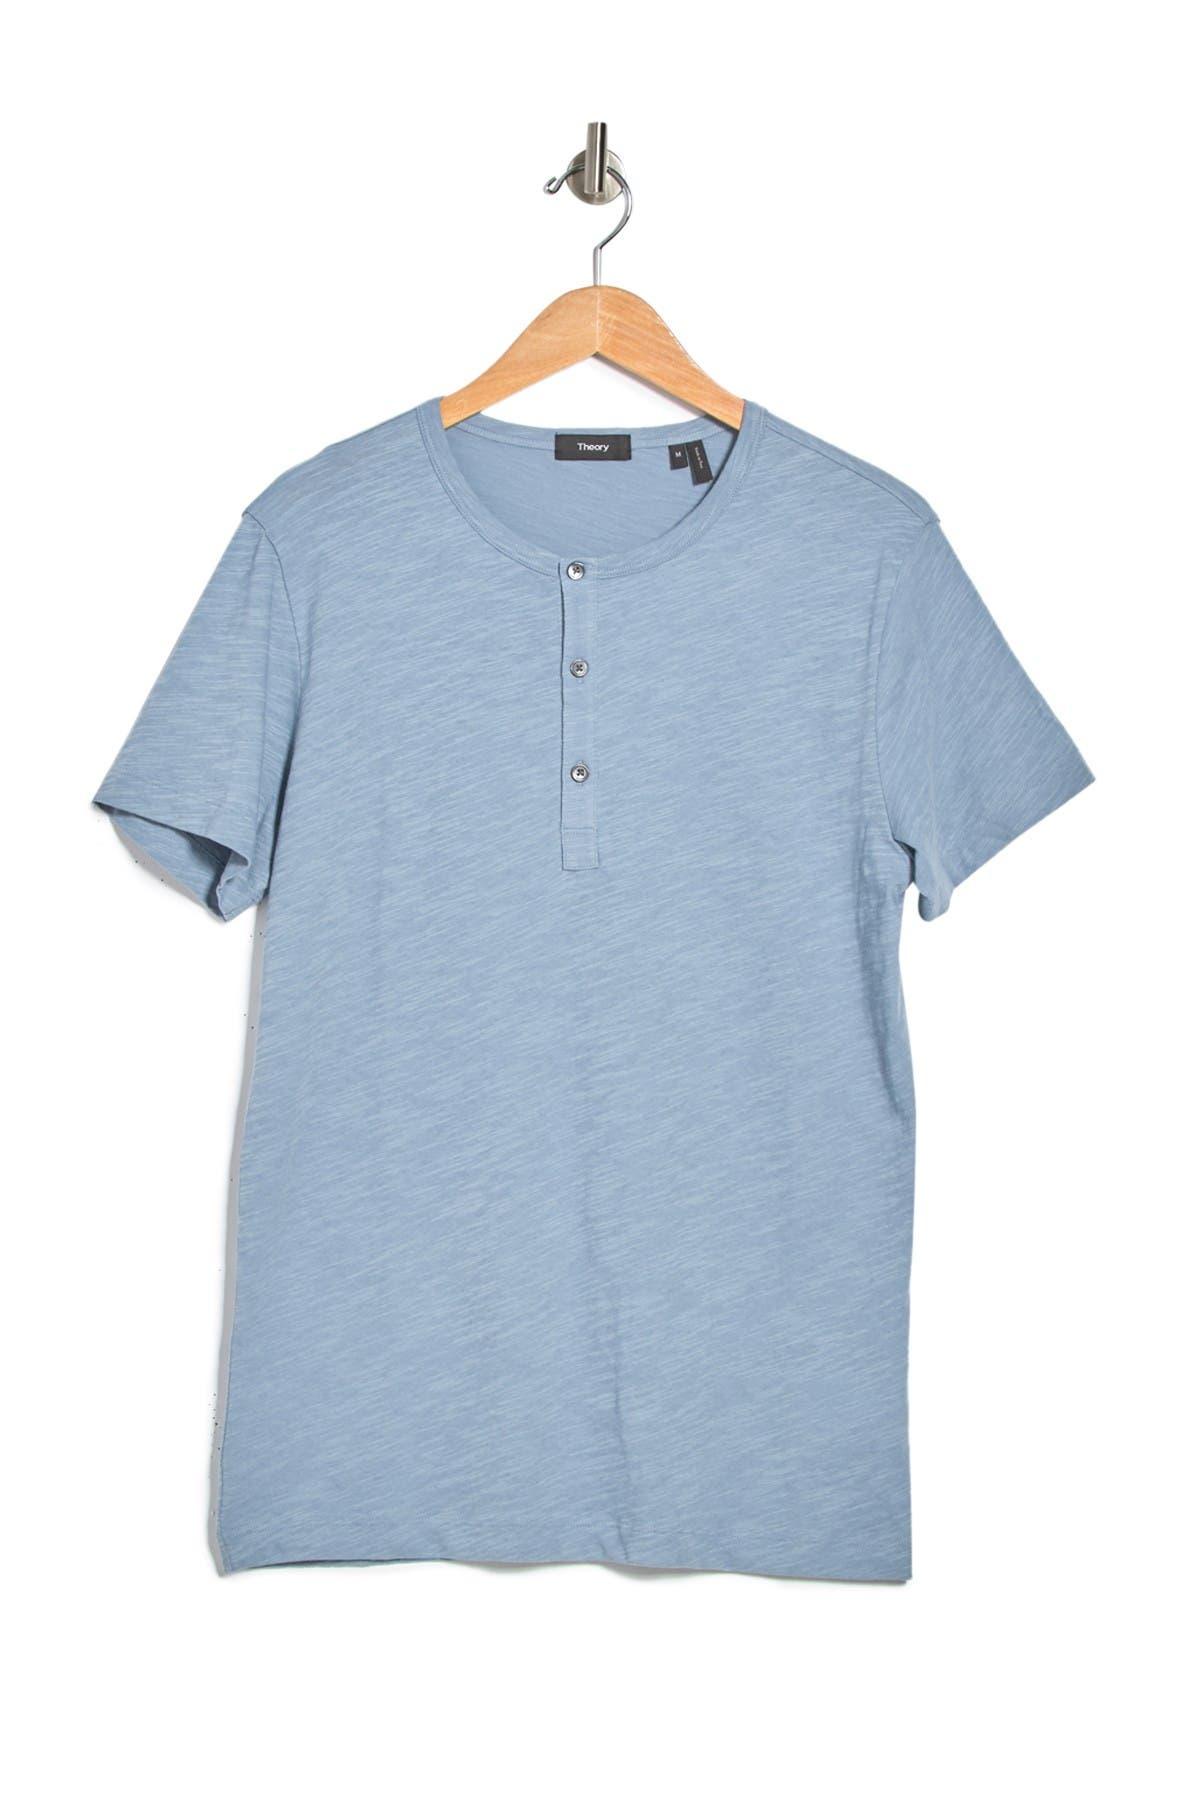 Theory Strato Arlee Short-Sleeve Henley shirt in sky blue